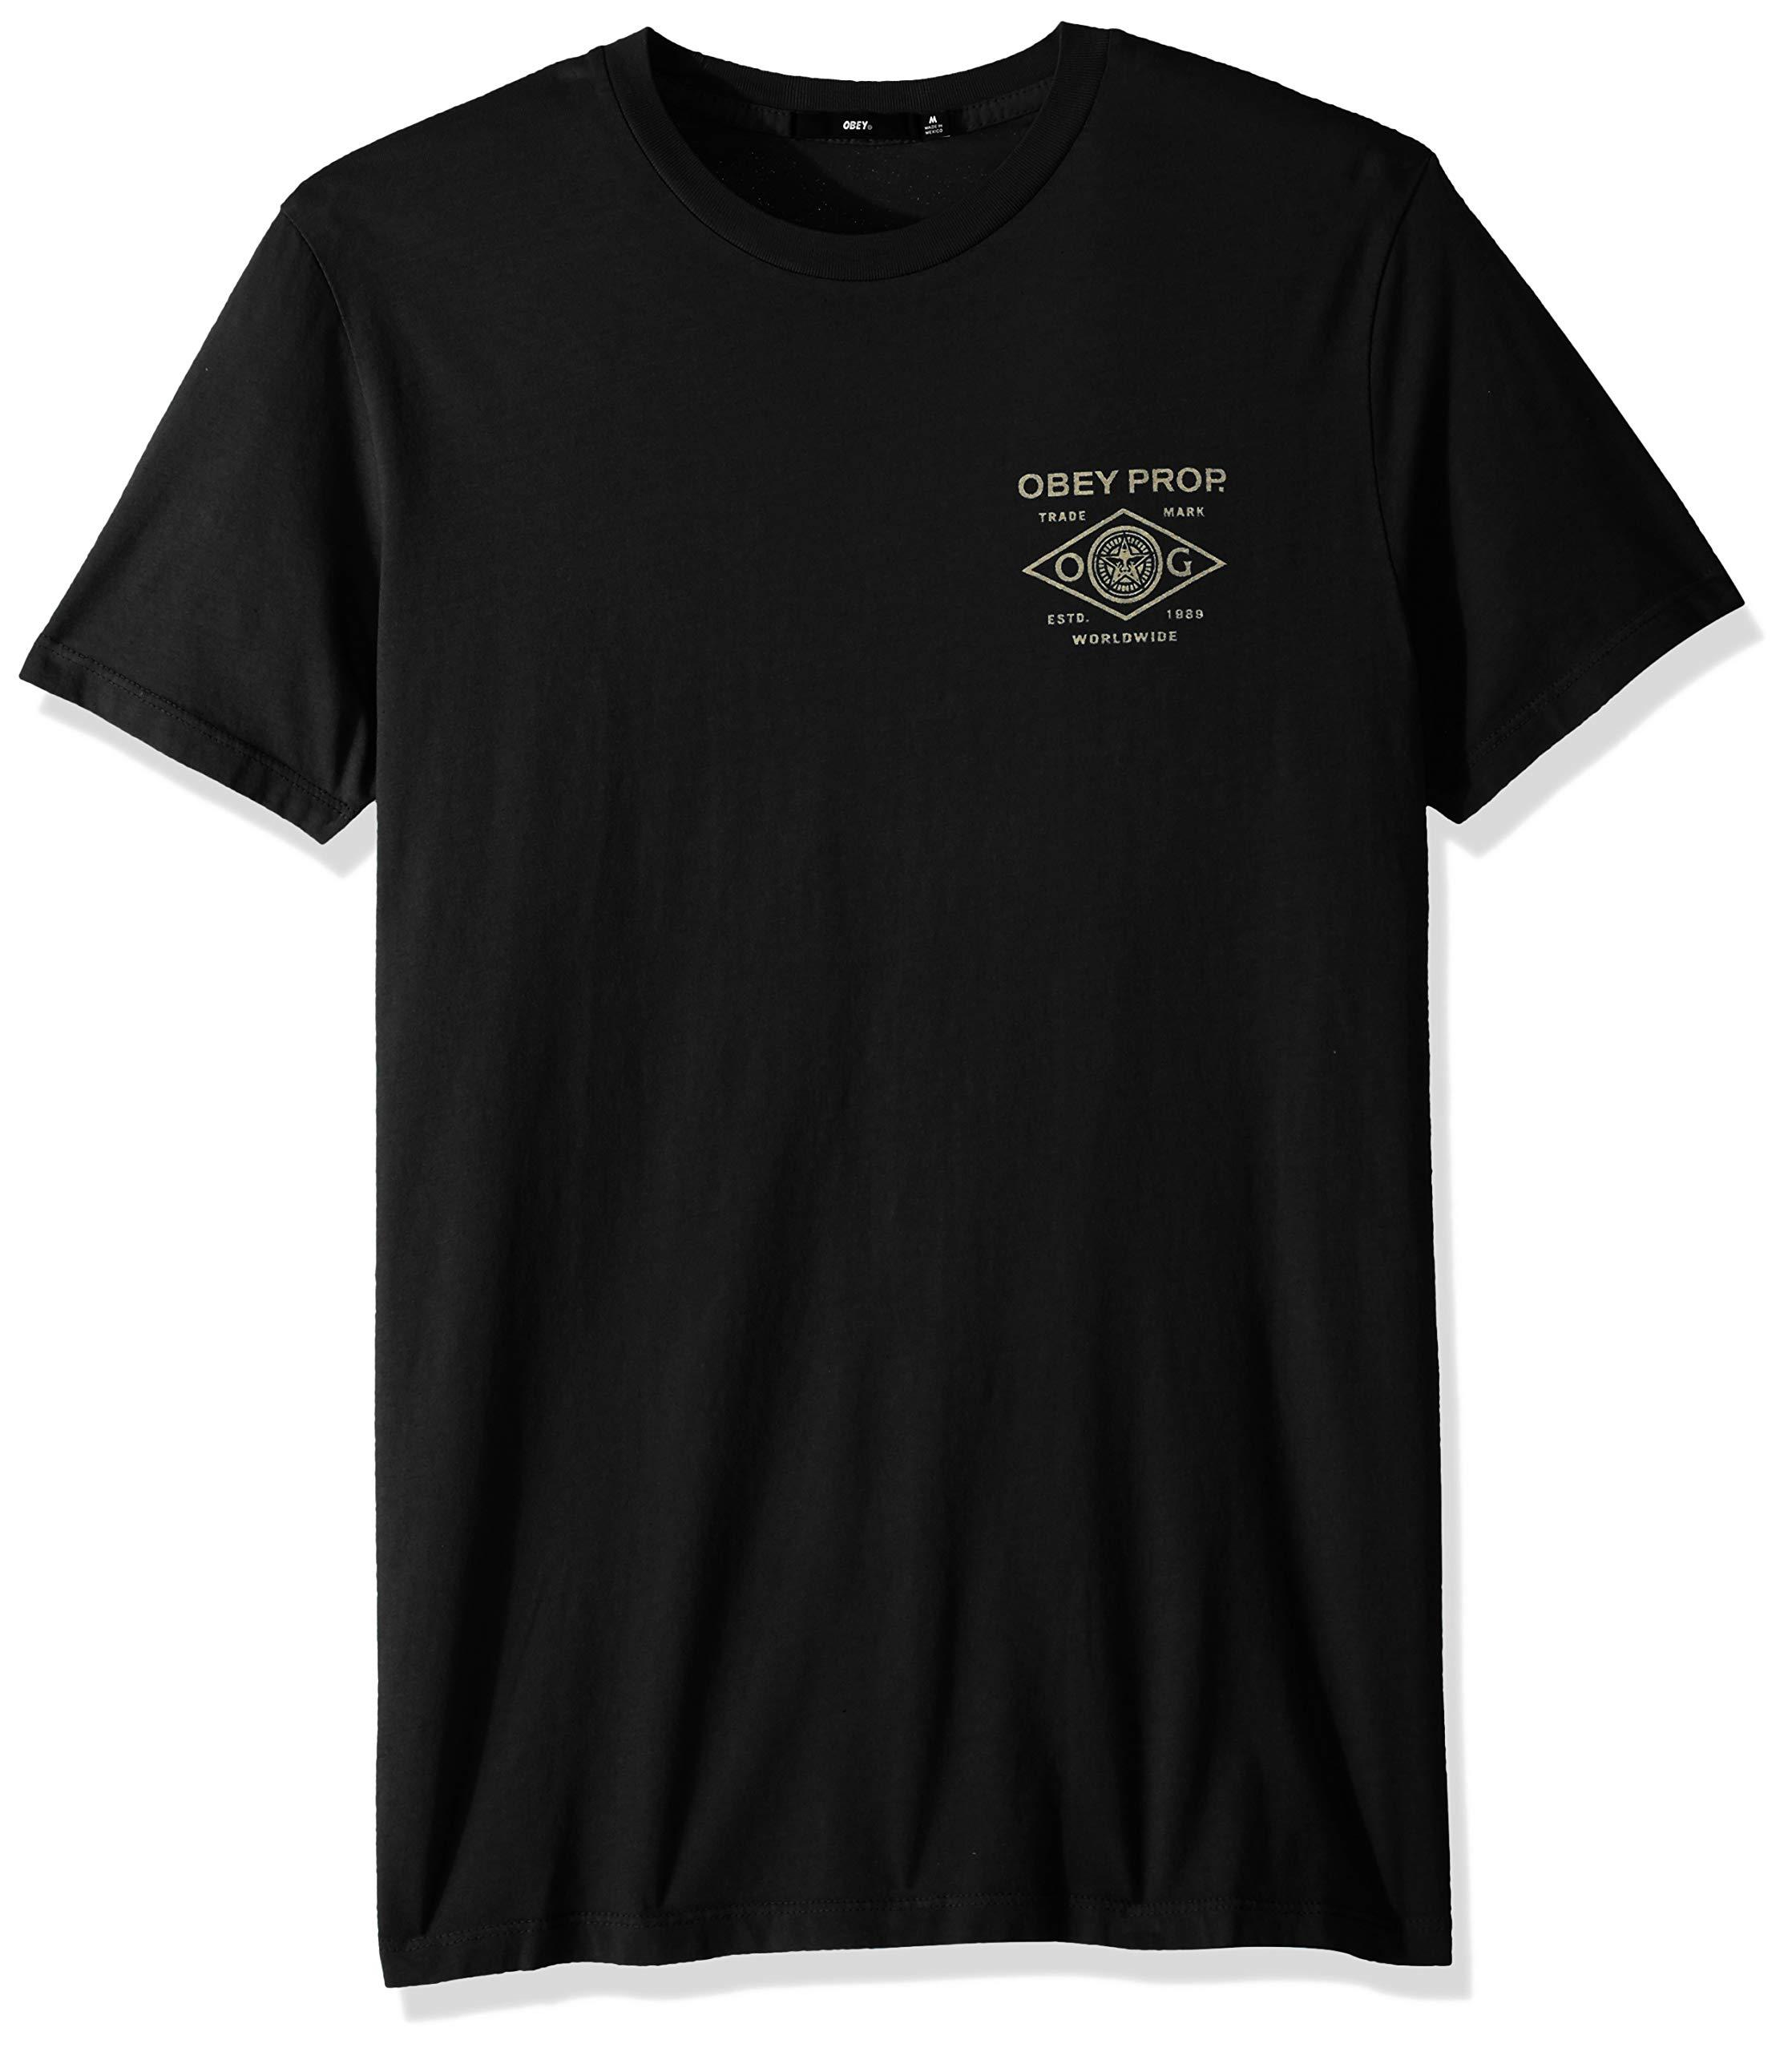 Obey Men's Prop. Trademark Short Sleeve Superior T-Shirt, Limo Black, Large